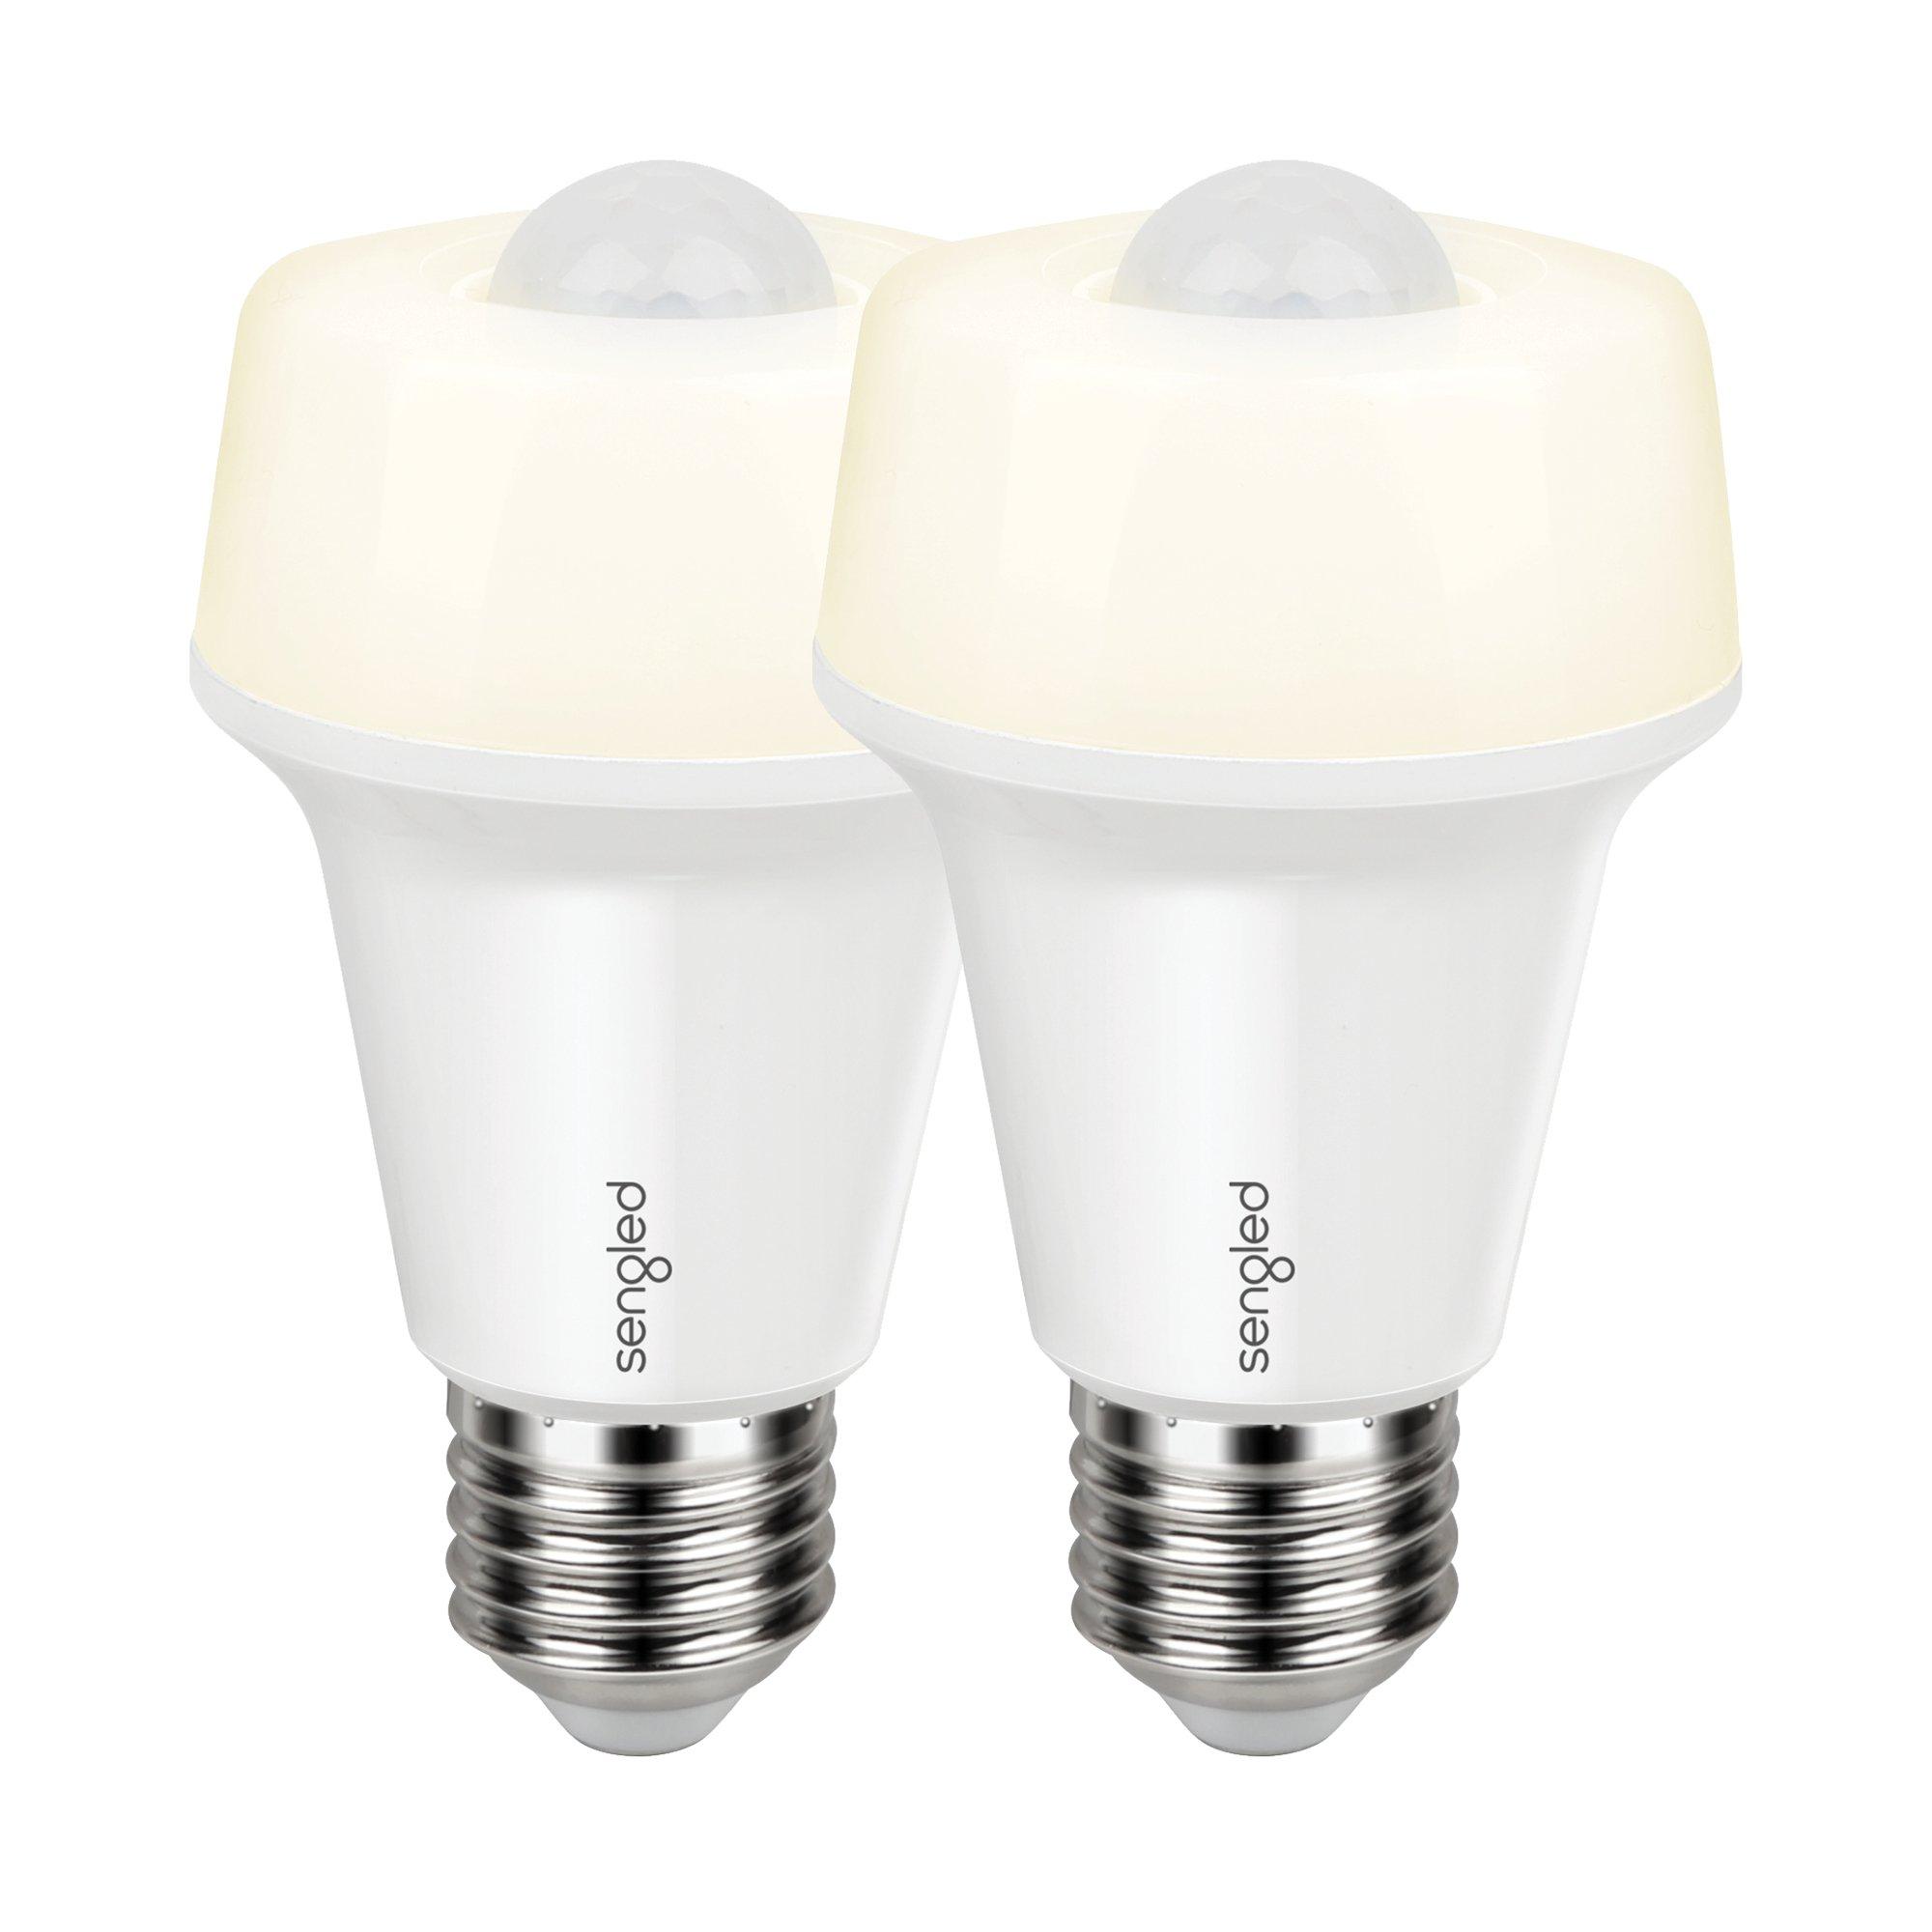 Sengled LED with Motion Sensor (Smartsense), Soft White 2700K, A19 60W Equivalent, Indoor Use, 2 Pack